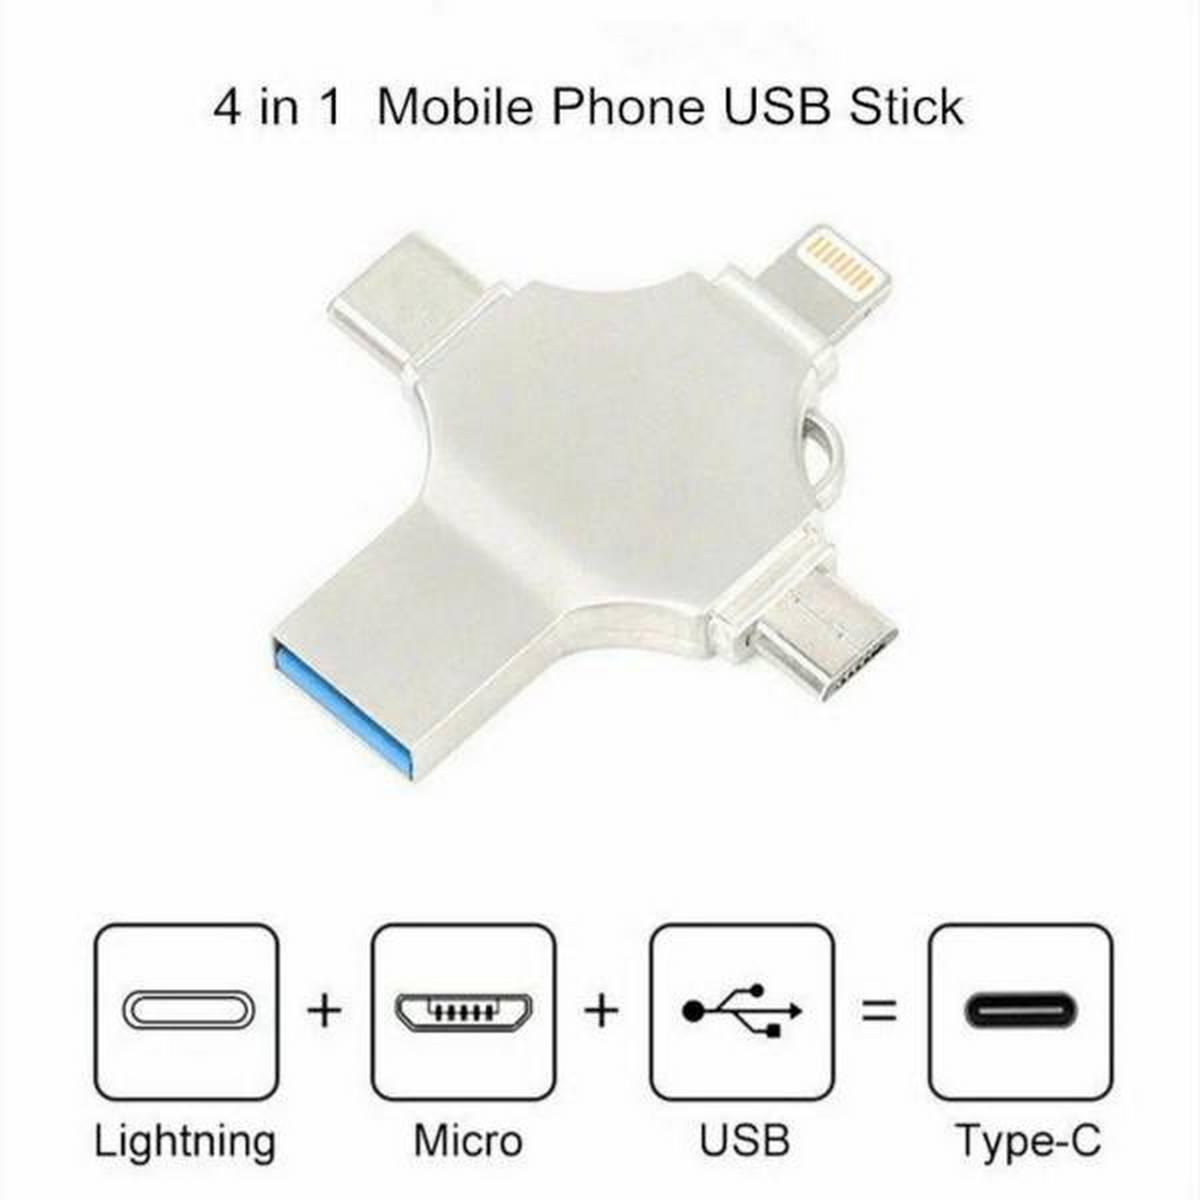 4 in 1 OTG USB Flash Drive For iPhone /Type C Device Micro Usb Stick 32gb  HD Flash Memory USB